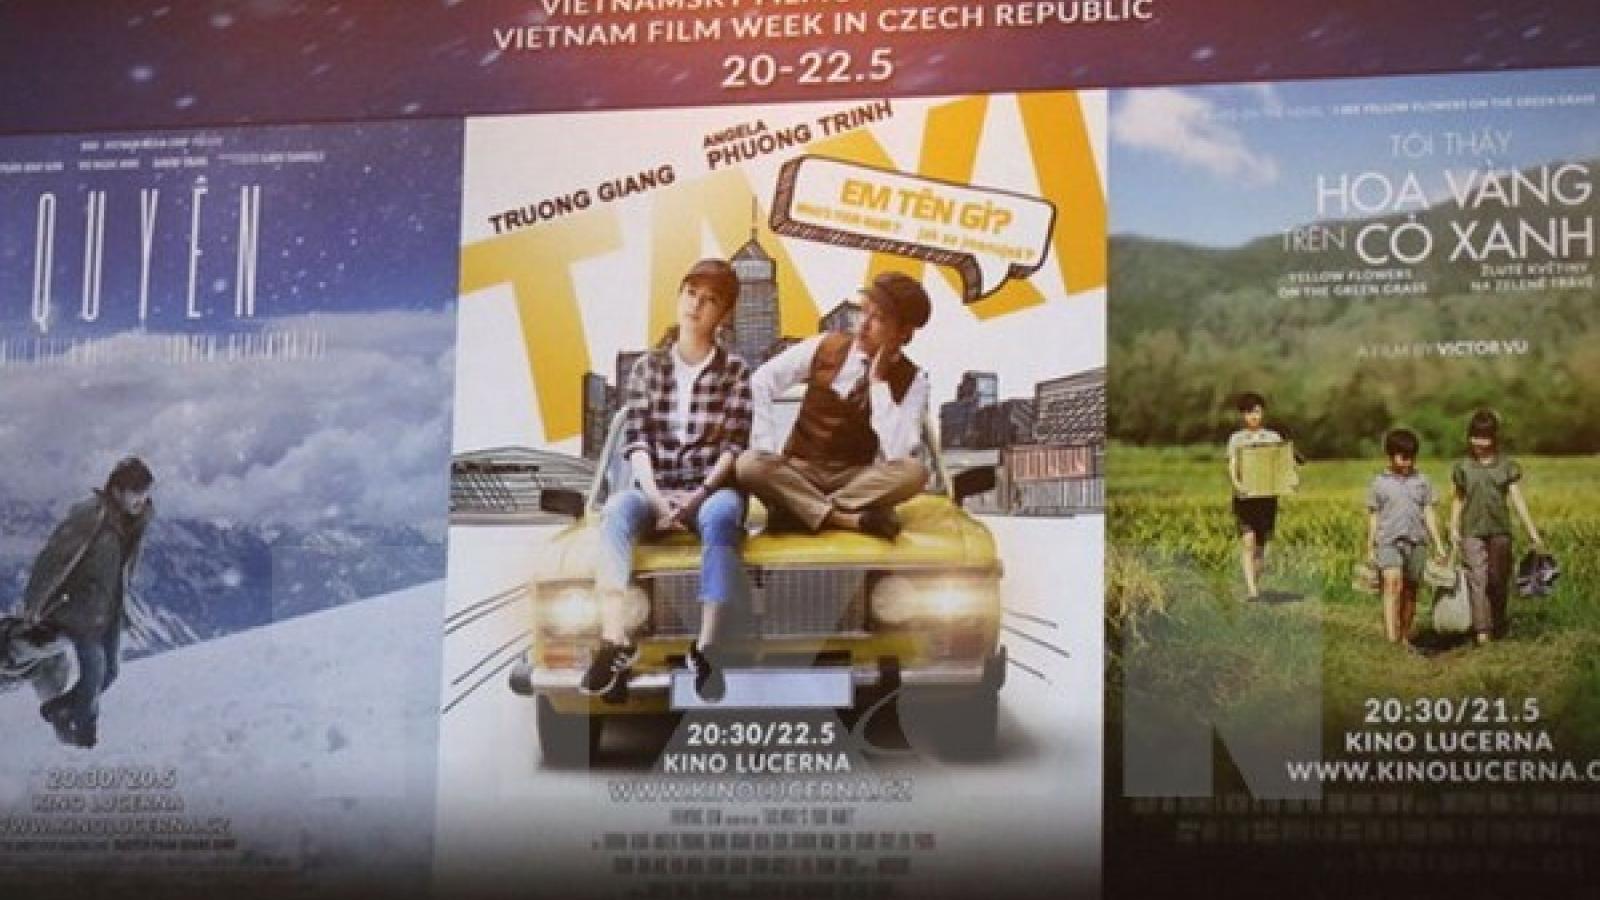 First Vietnam film week opens in Czech Republic